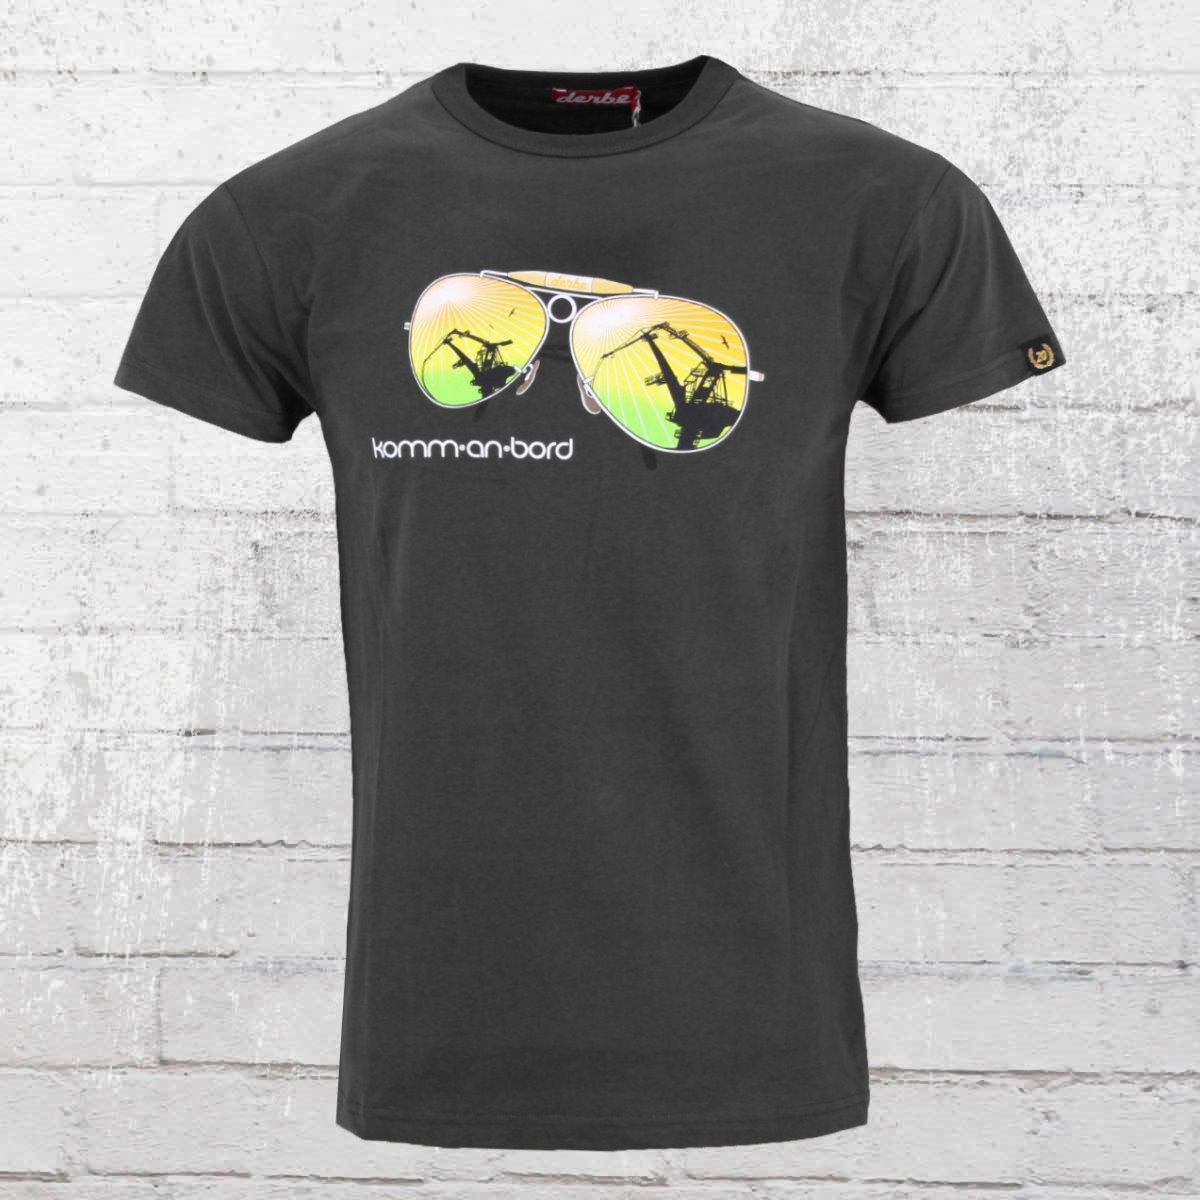 Derbe Hamburg Herren T-Shirt Komm An Bord grau